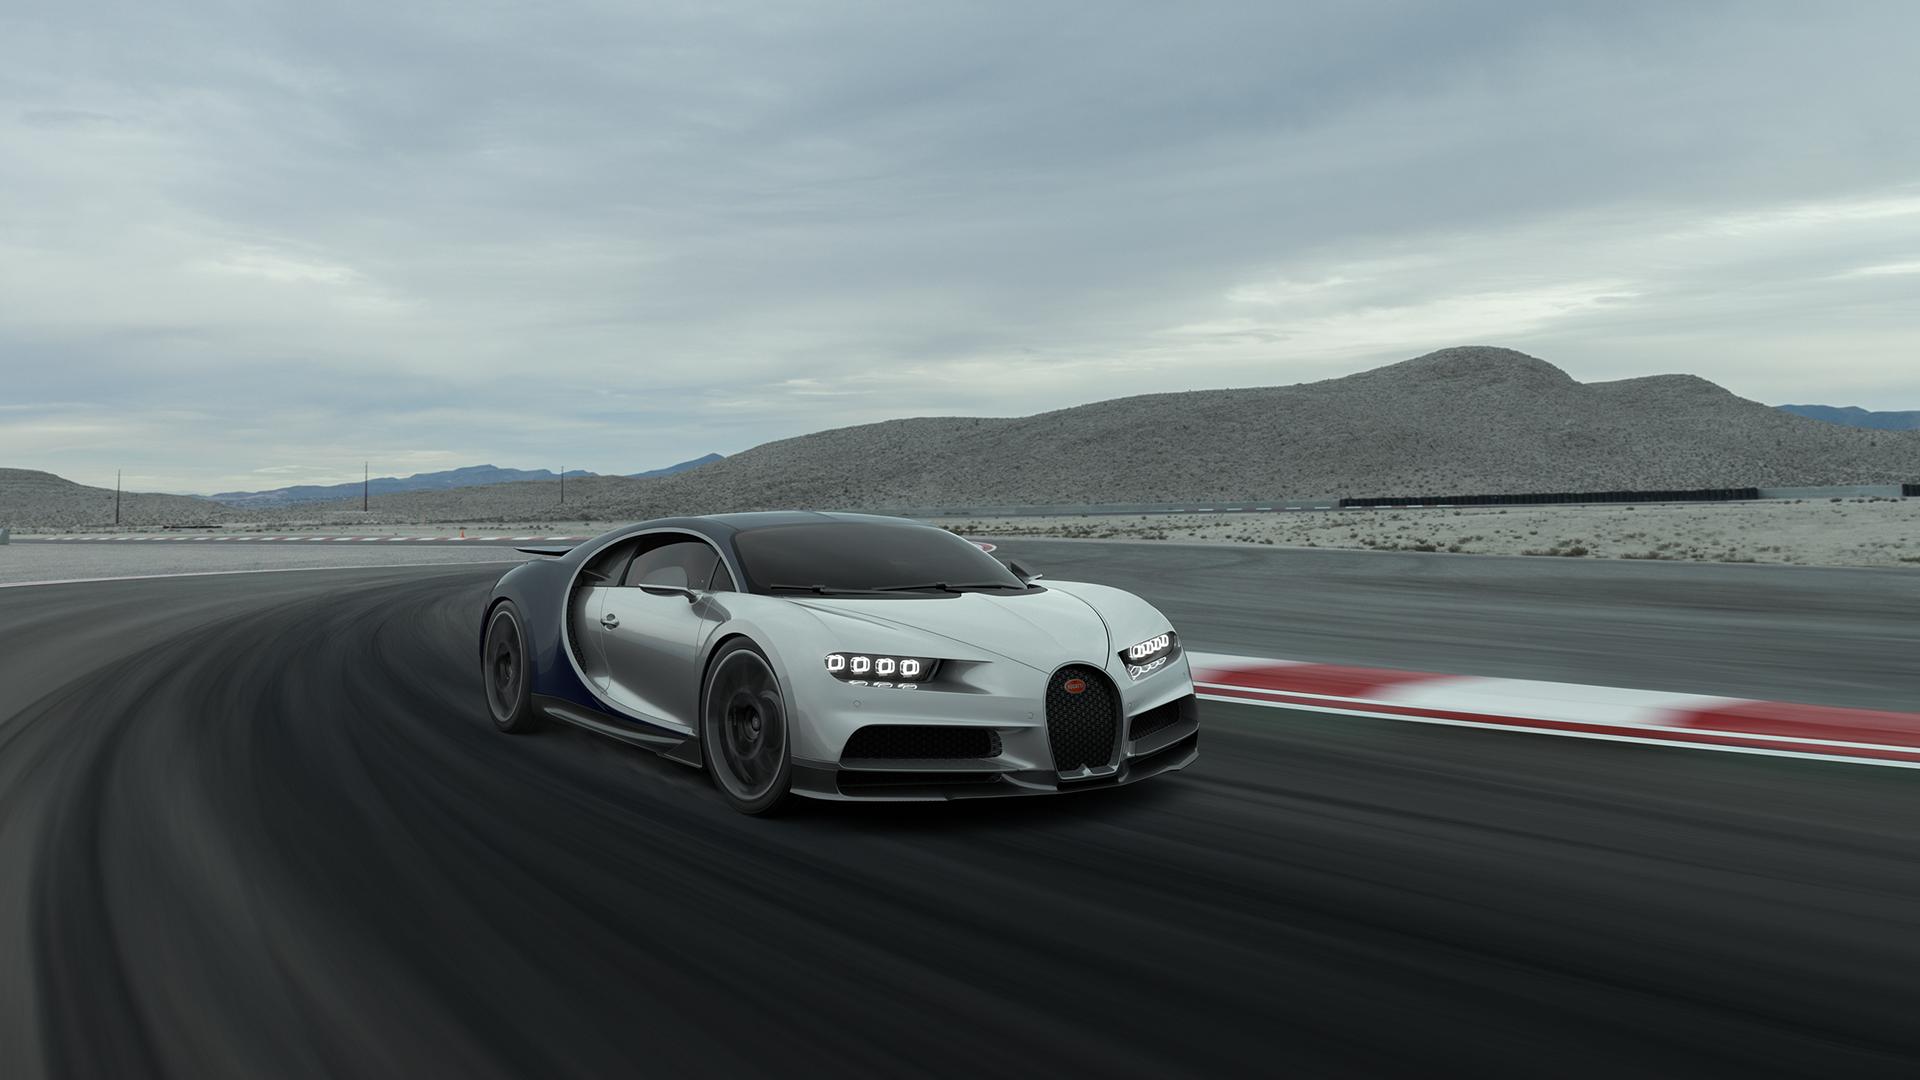 Bugatti Veyron Hd Wallpapers Yummytabs